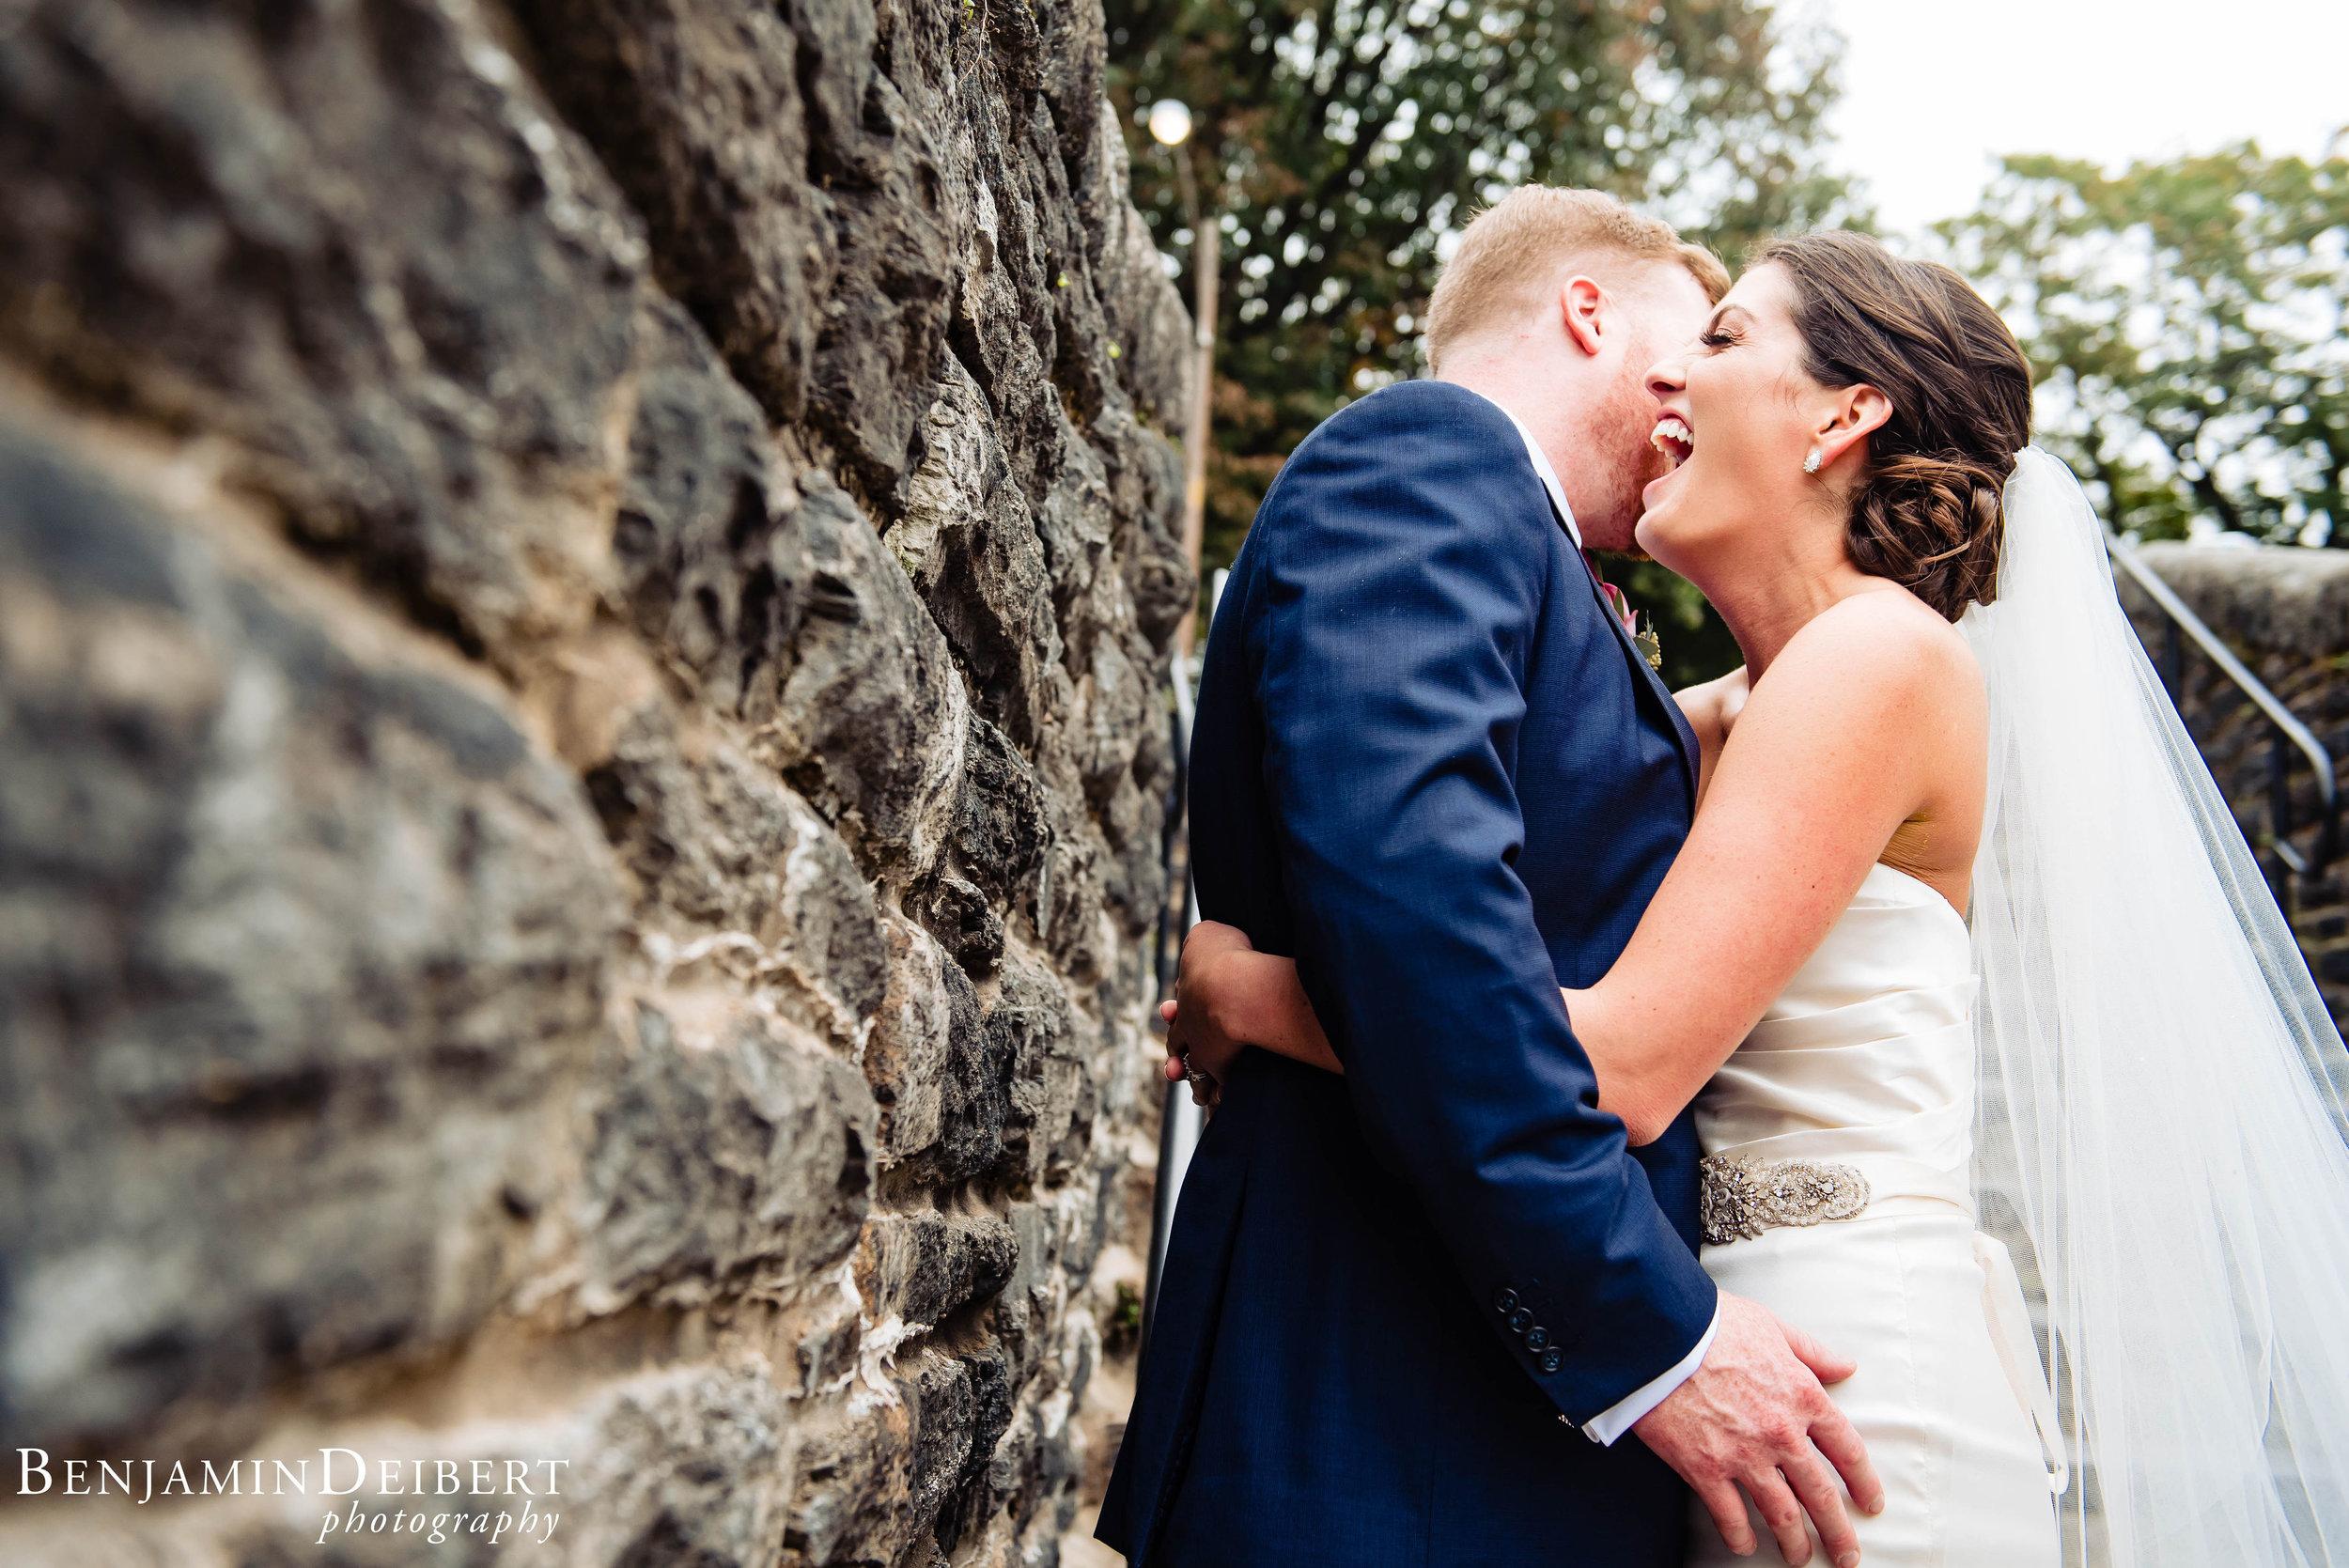 TeghanandChris_BridgemensBallroom_Wedding-60.jpg